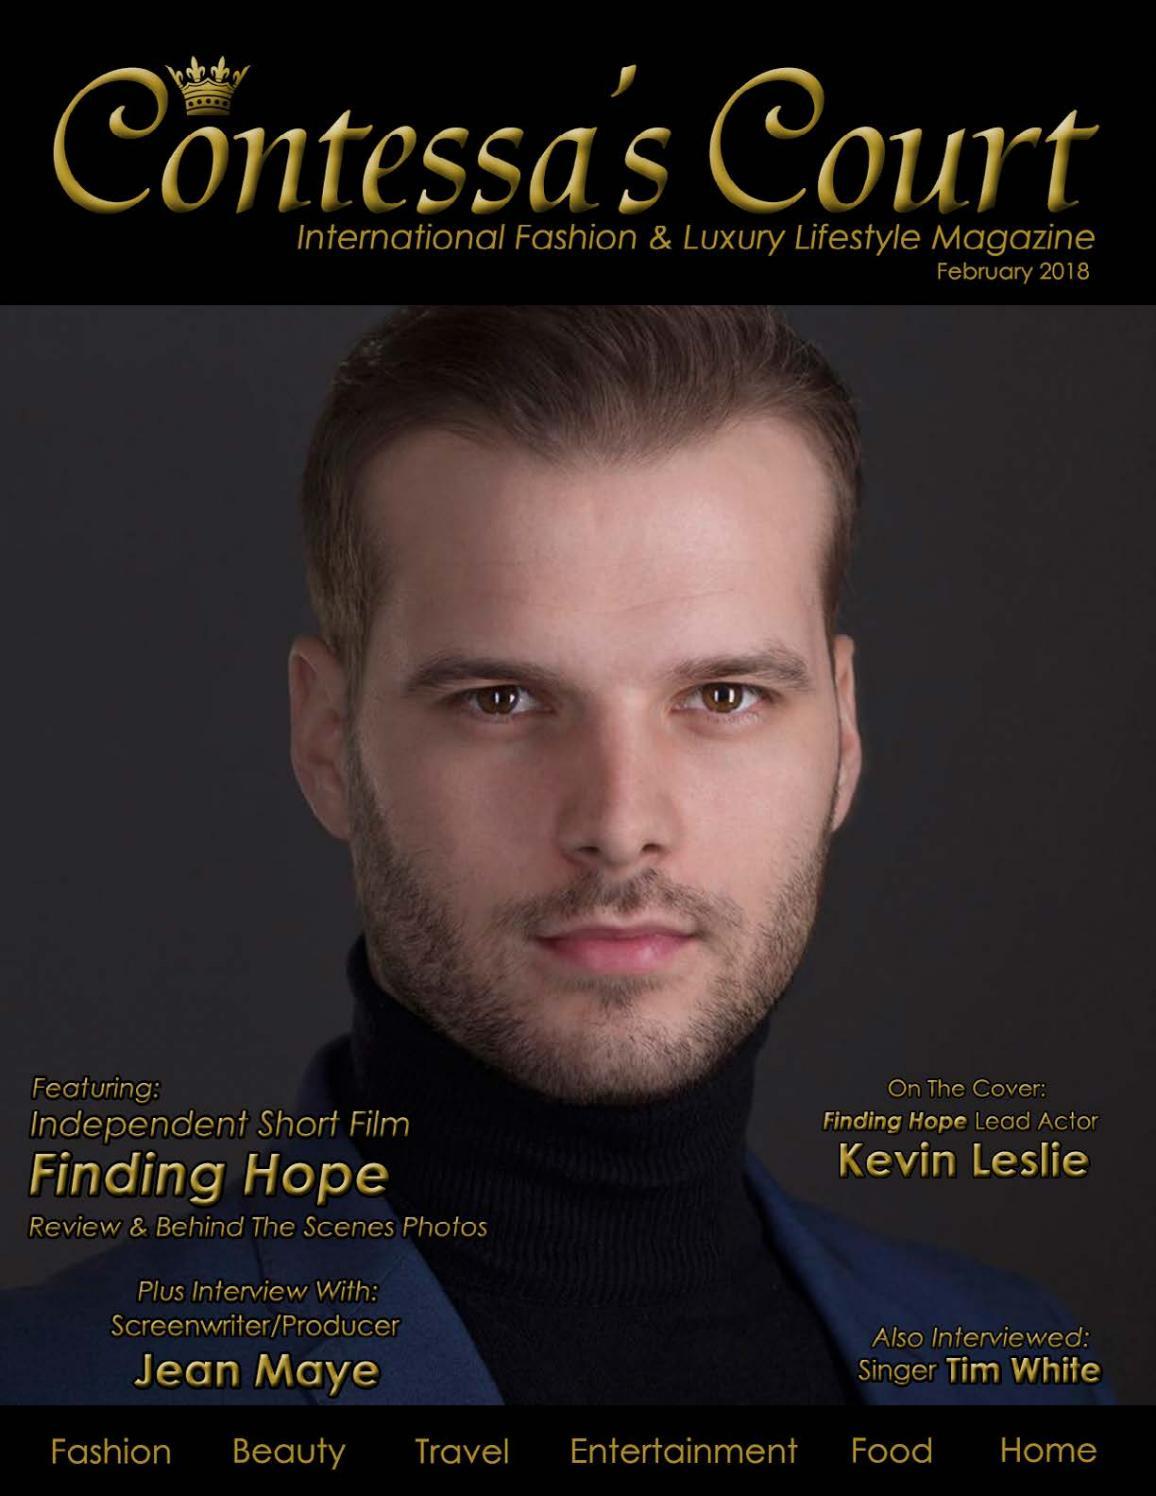 Contessa's Court February 2018 by Contessa's Court - issuu